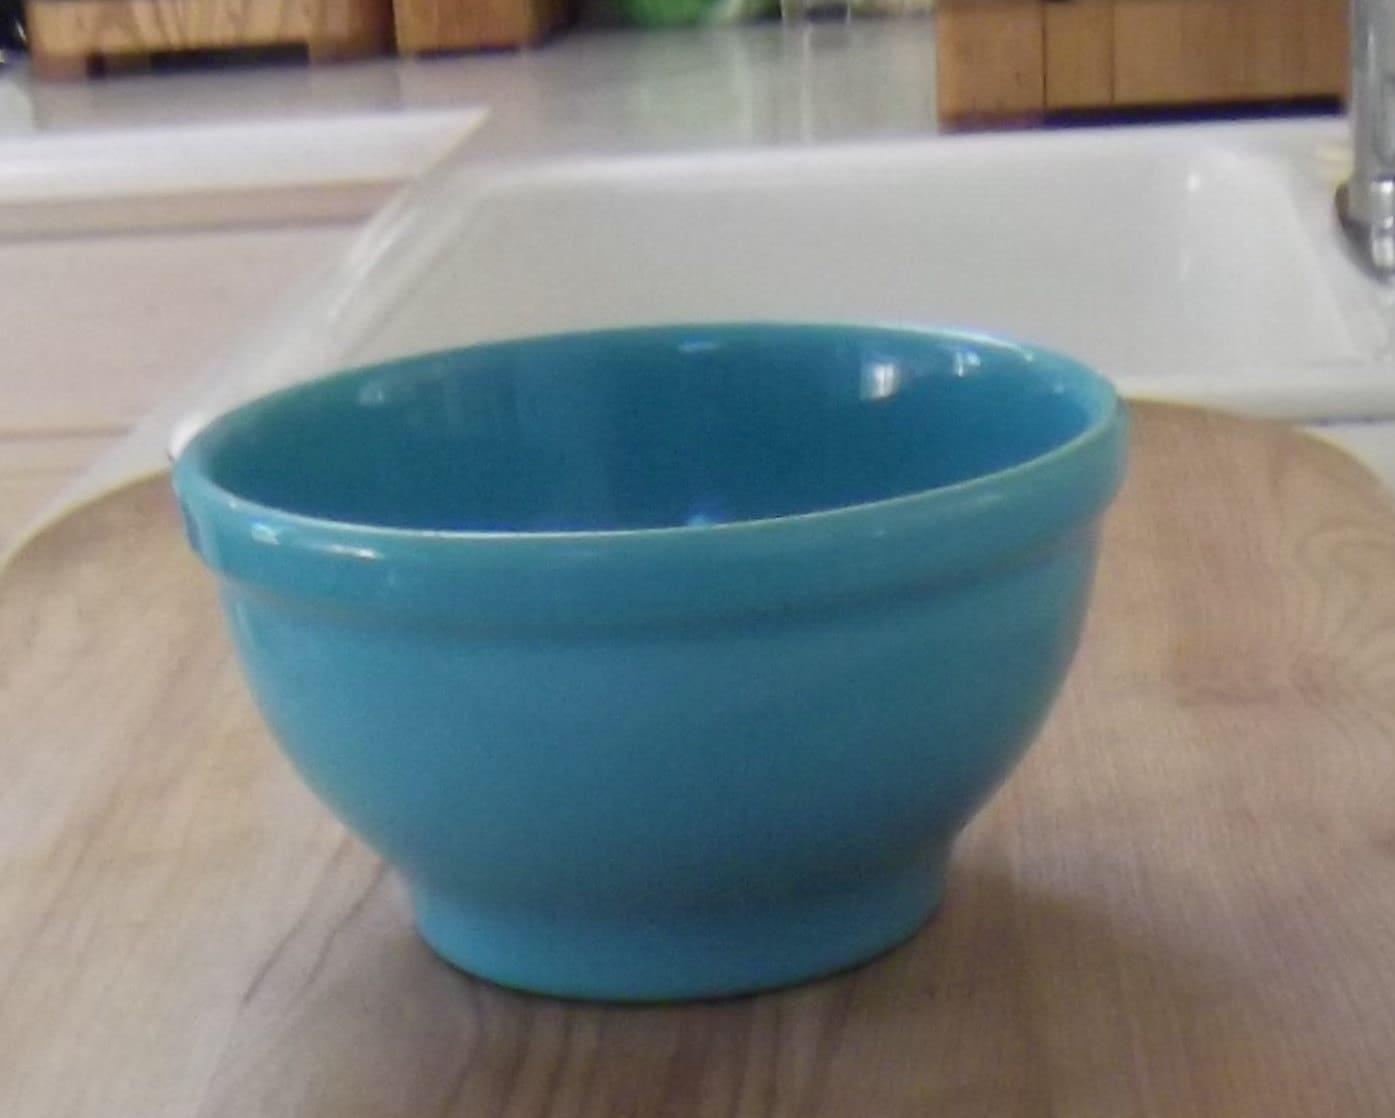 Mid-Century Metlox Bowl, Turquoise Ceramic, Vintage, Retro ...